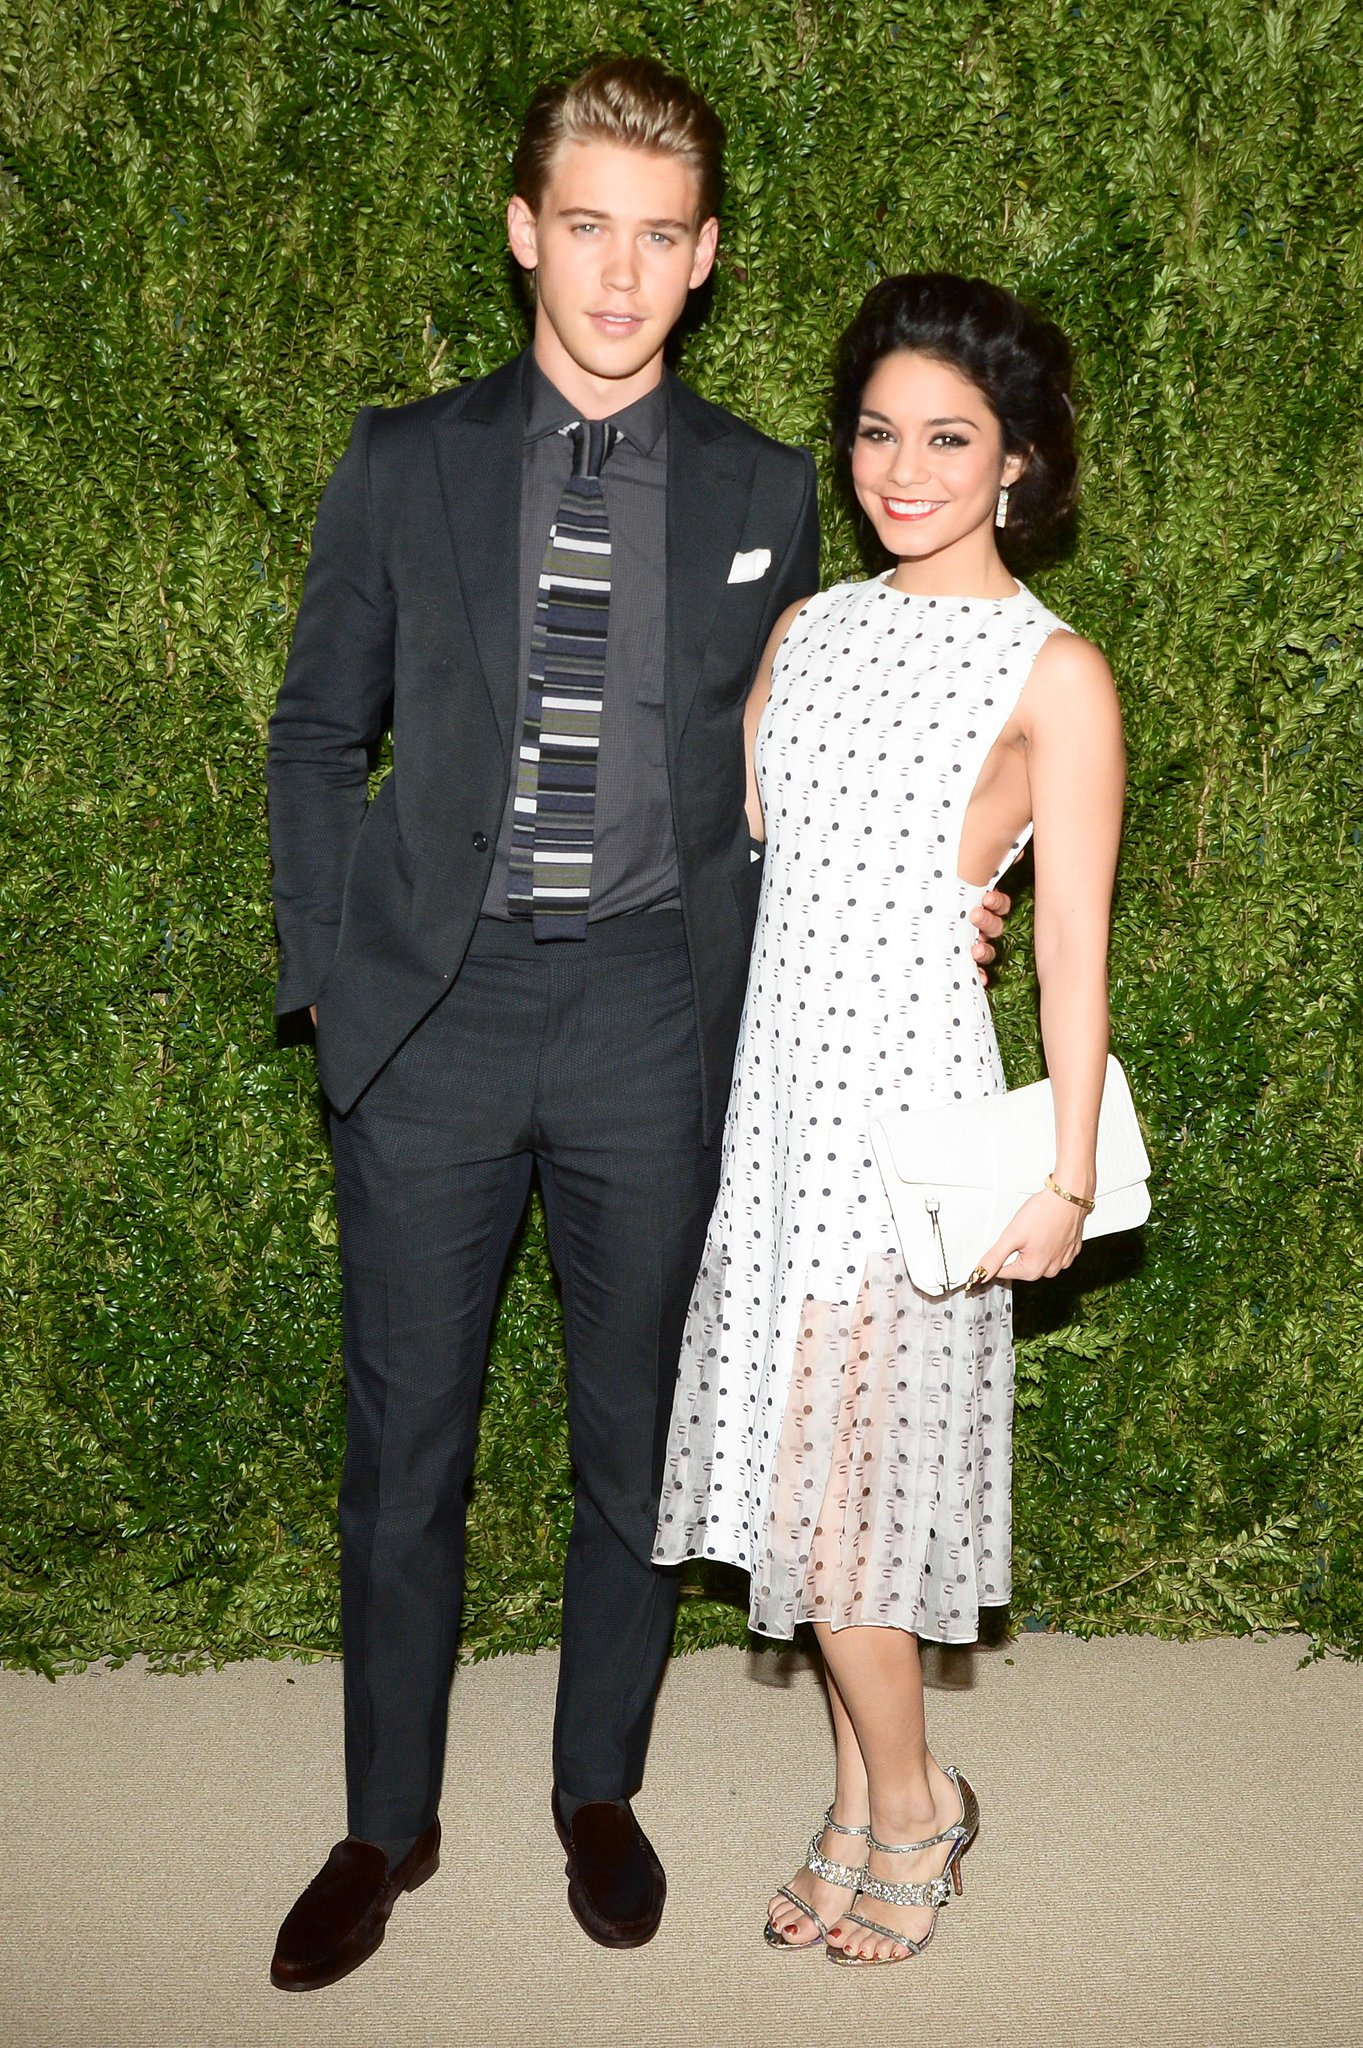 Austin Butler and Vanessa Hudgens in Thakoon Resort 2014.